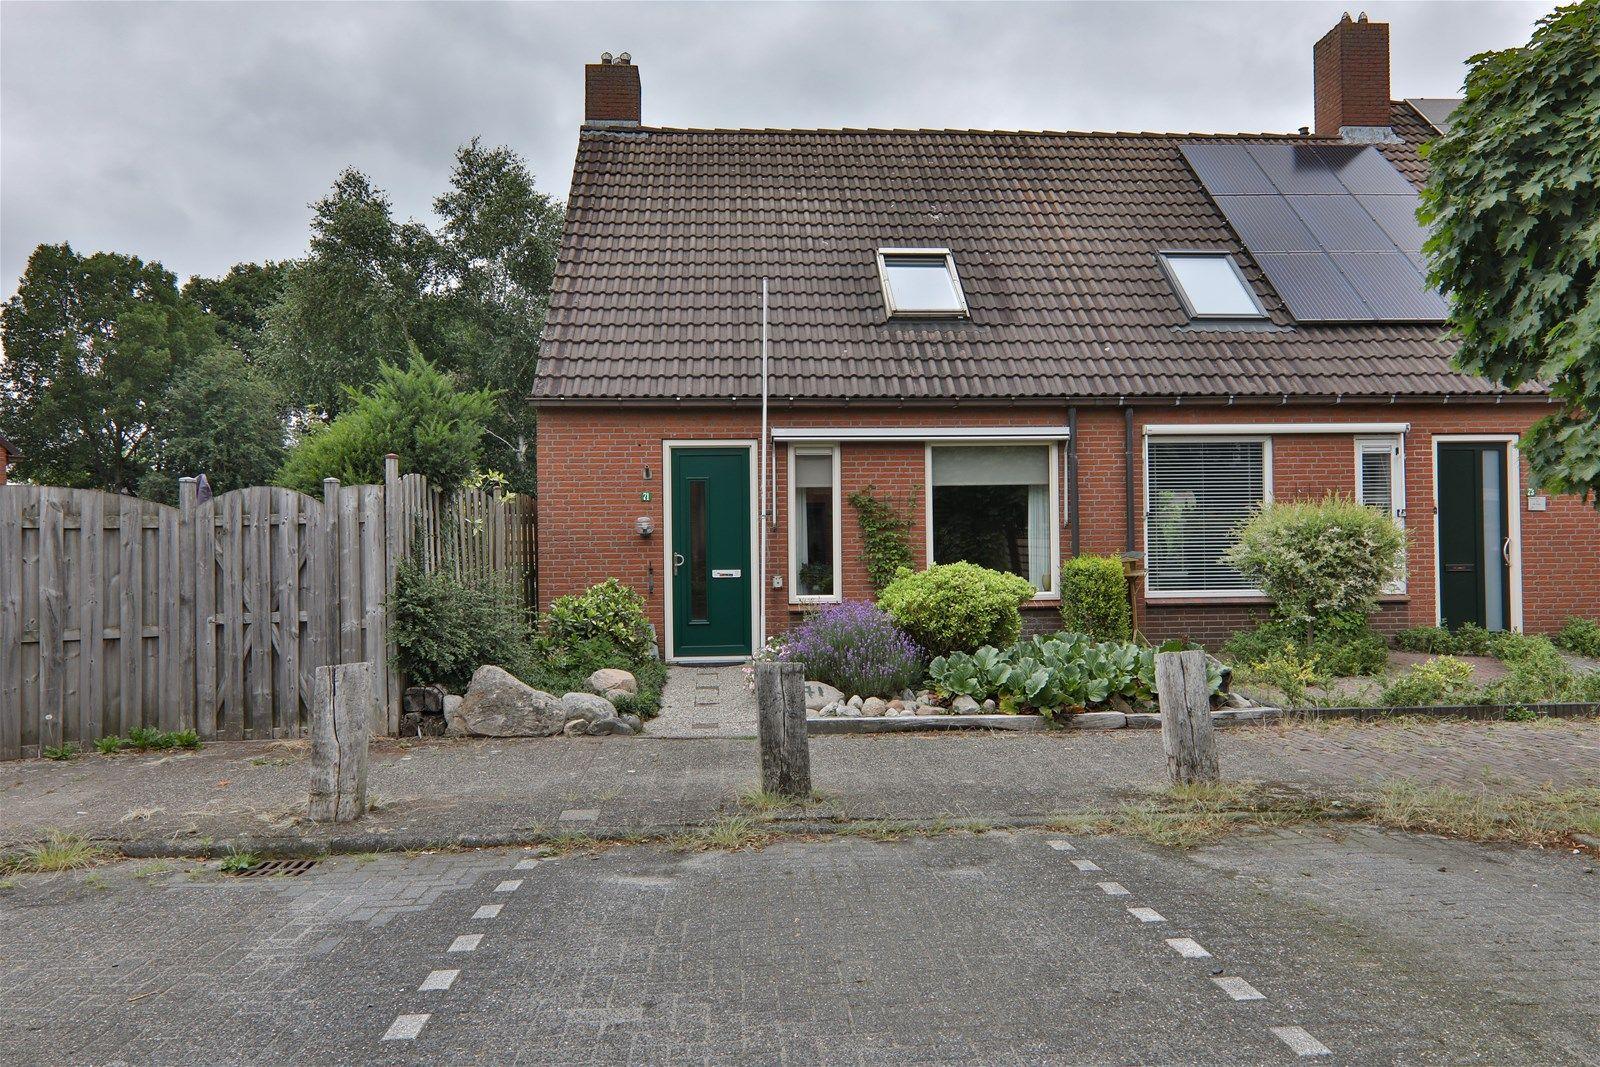 Mantinghstraat 71, Hoogeveen